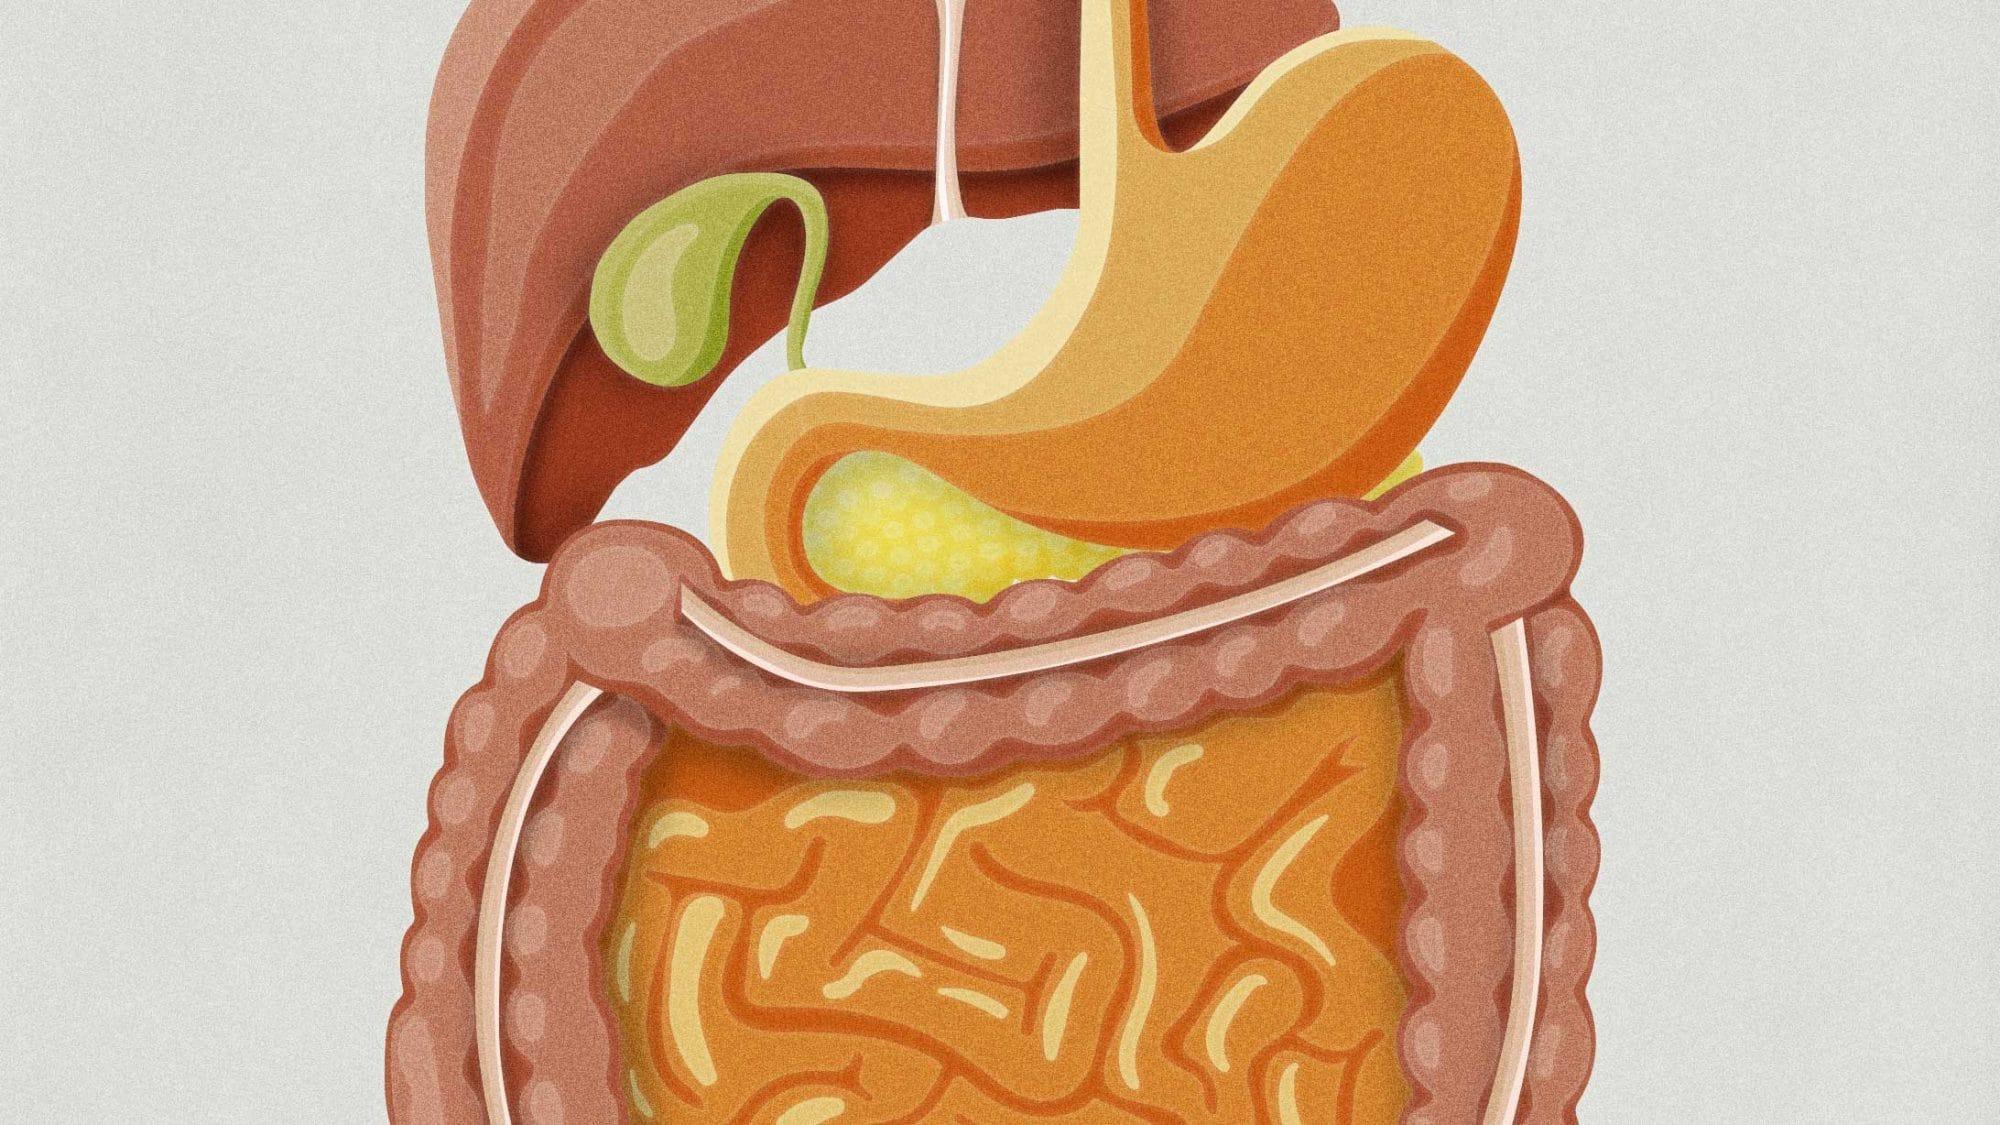 KSB Microsite Bauch